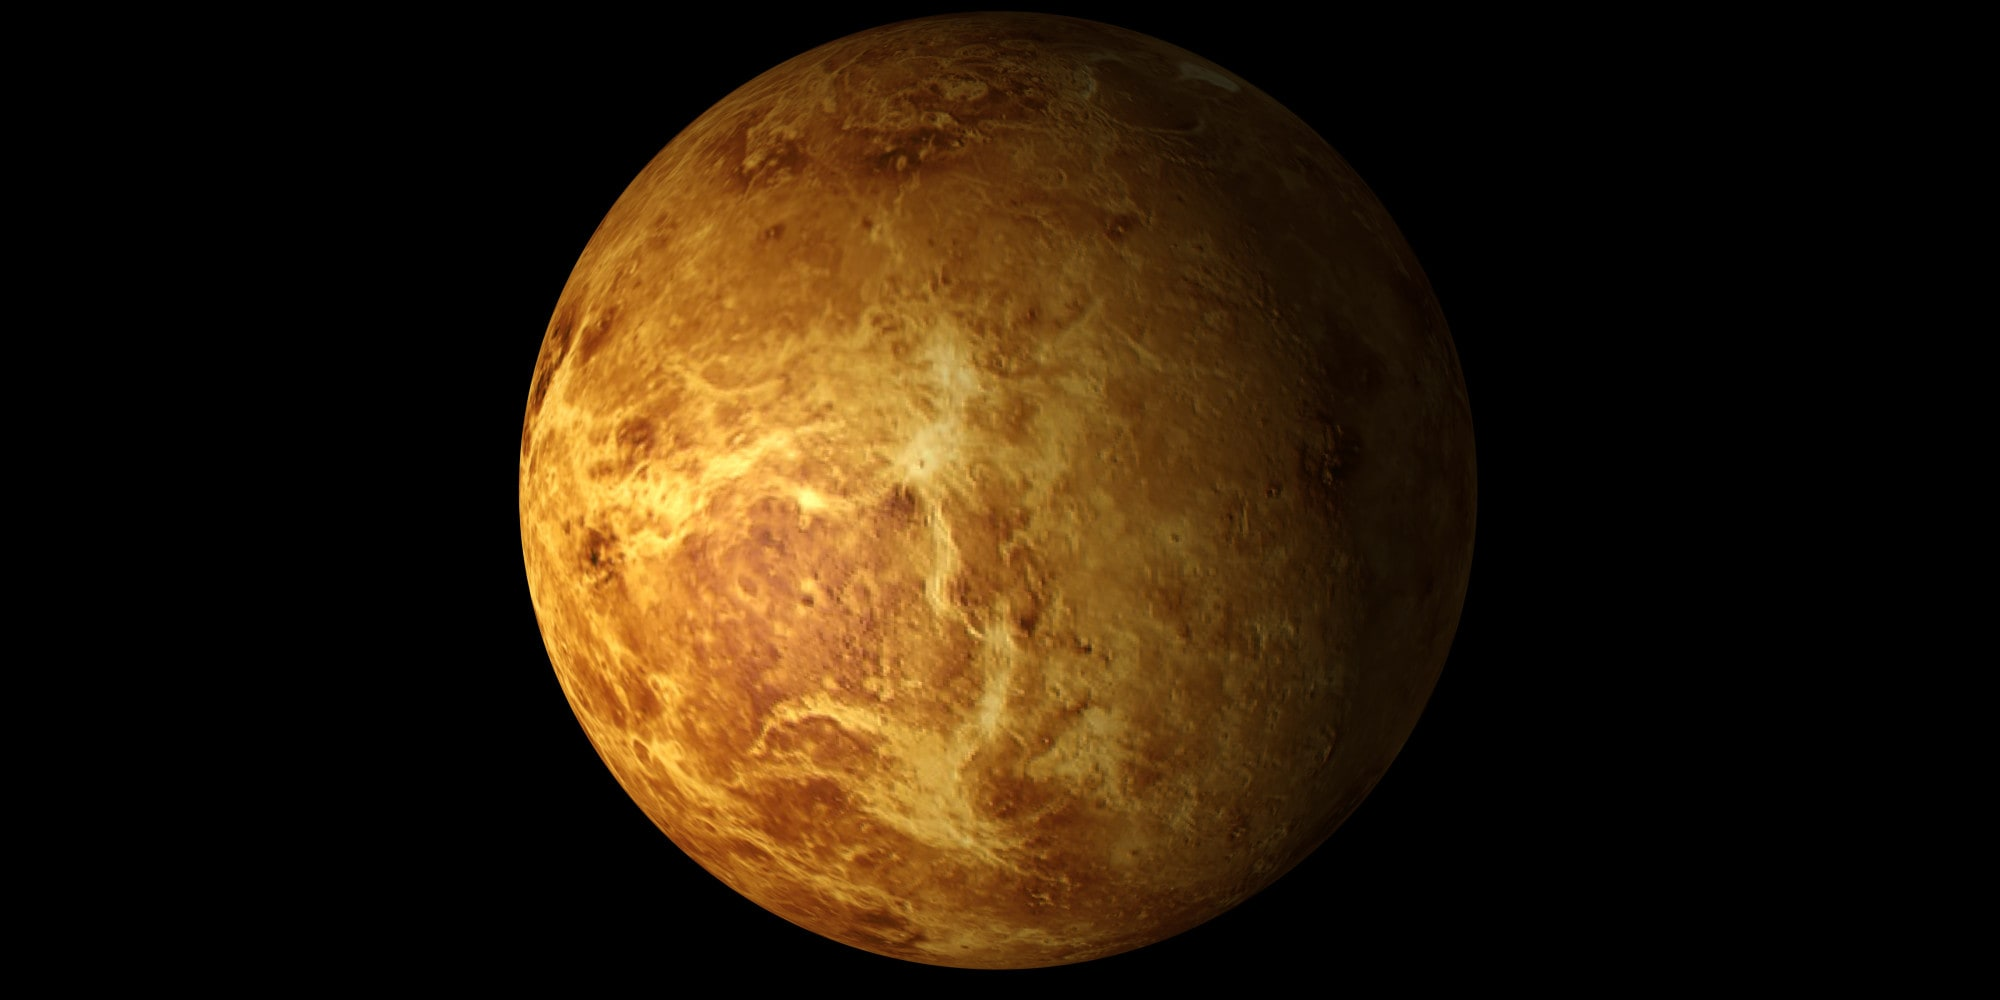 Venus hd desktop wallpapers 7wallpapers venus screensavers venus background voltagebd Choice Image